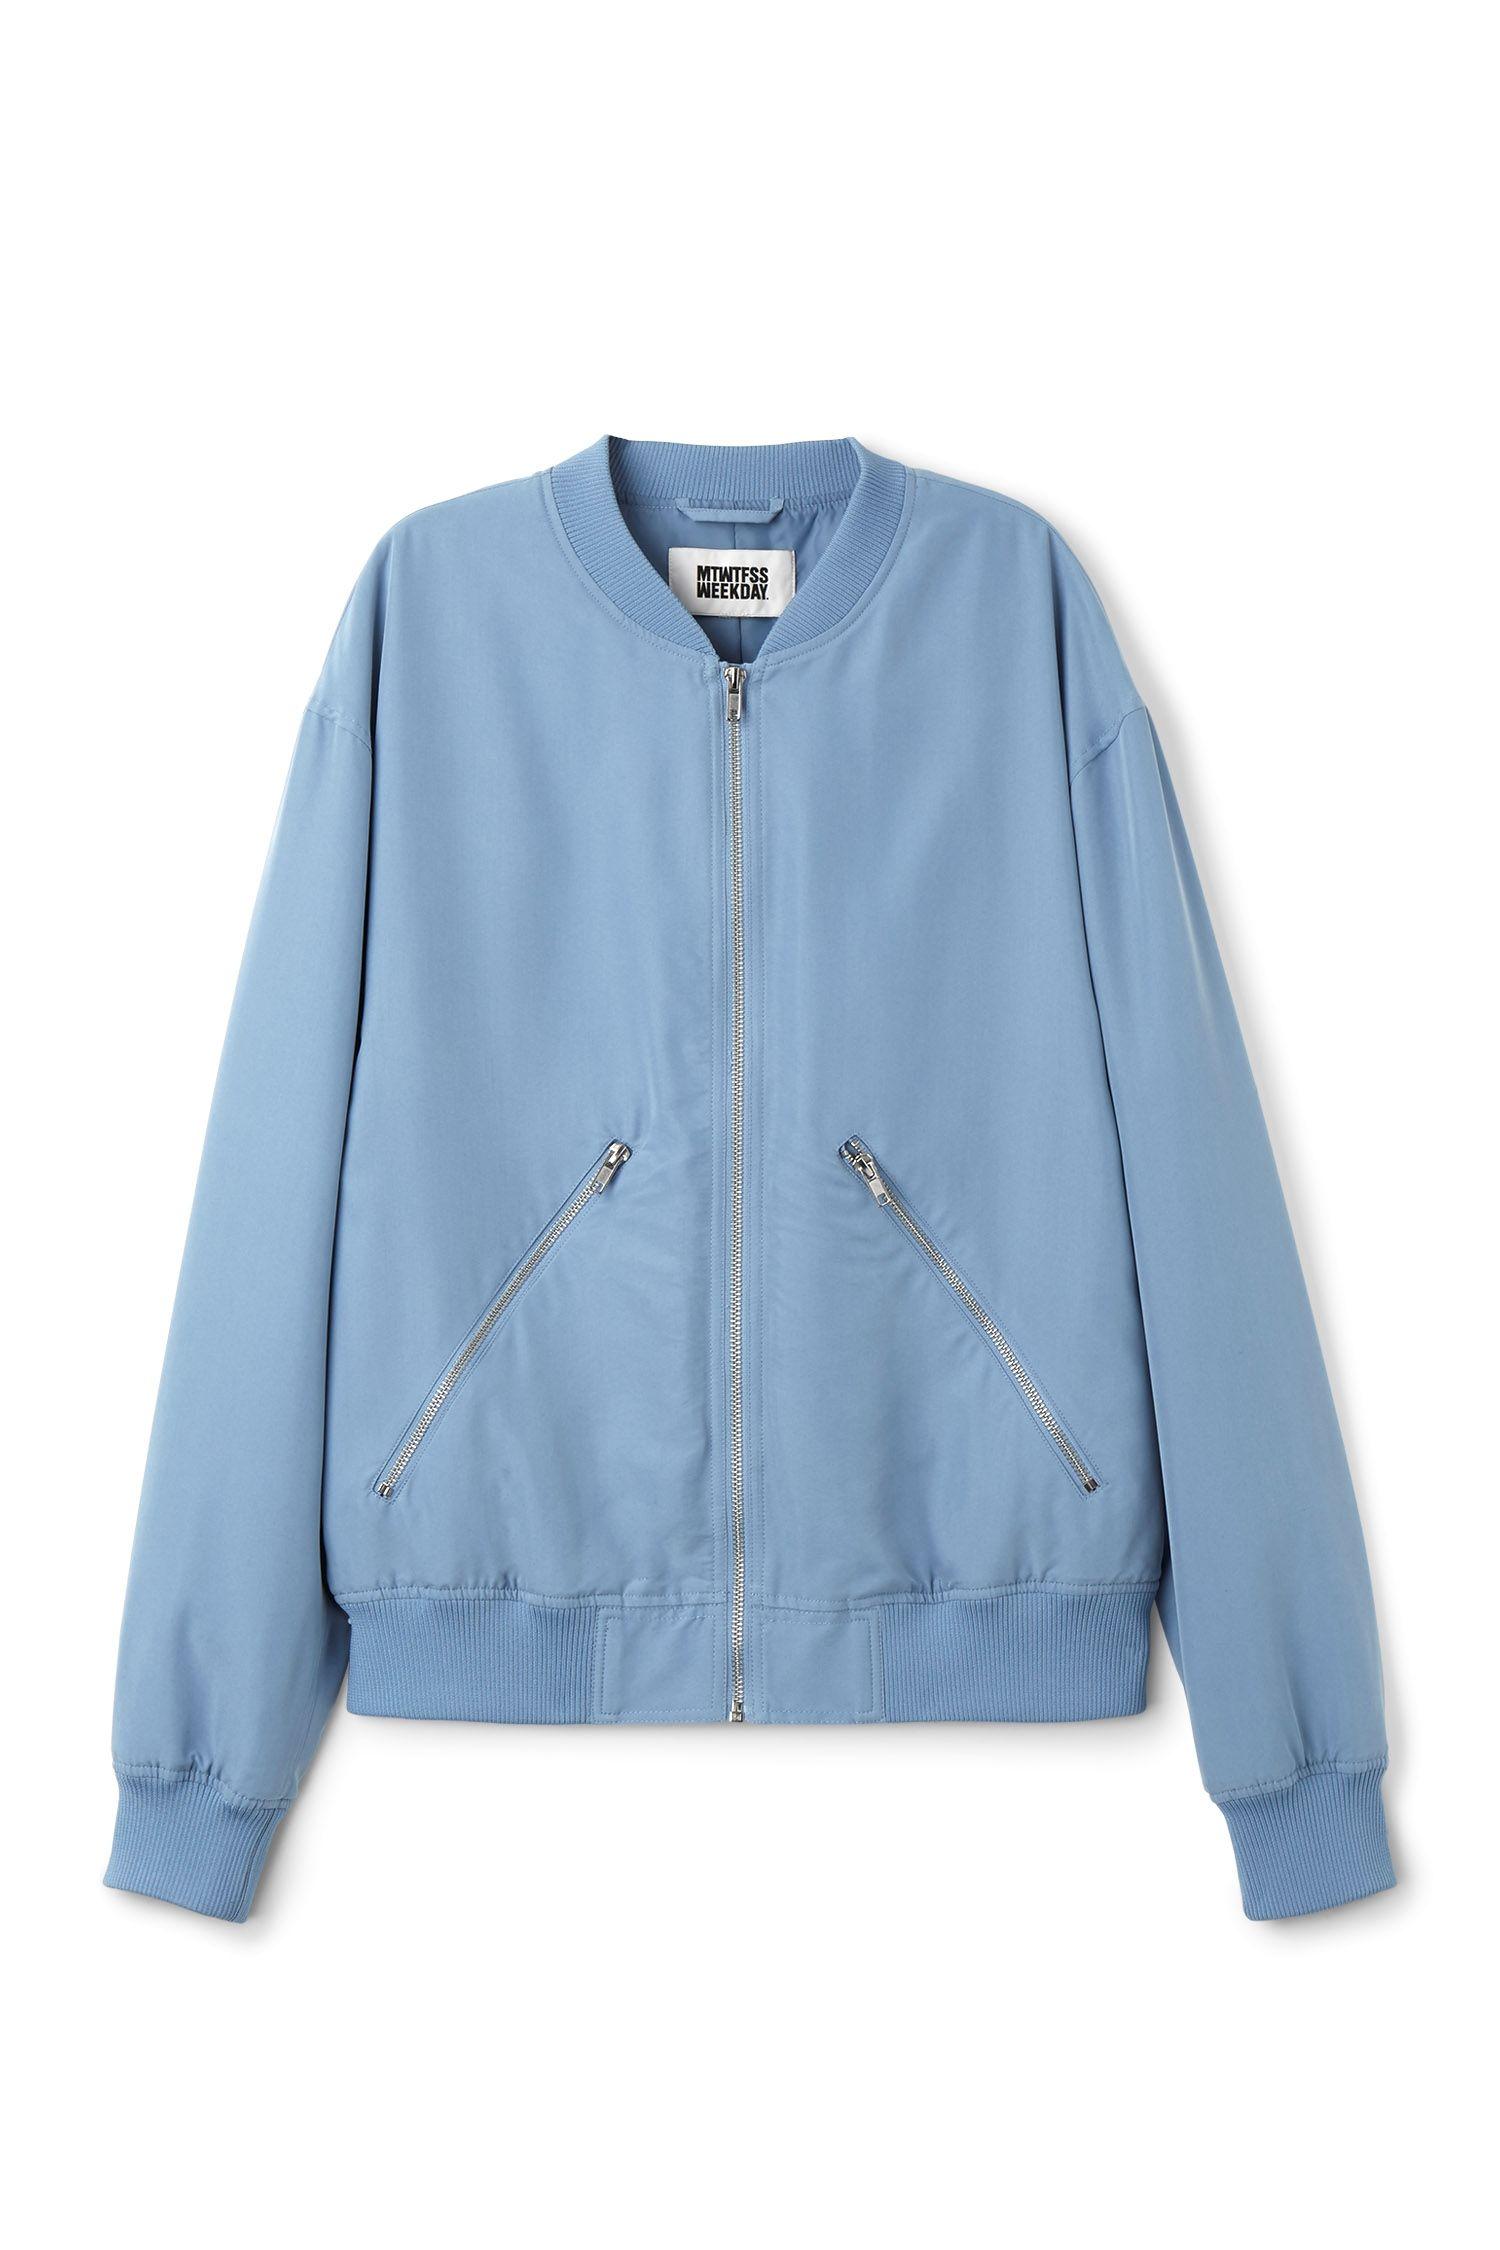 Weekday Image 22 Of Monoc Bomber Jacket In Blue Shop Womens Jackets Jackets Bomber Jacket [ 2250 x 1500 Pixel ]